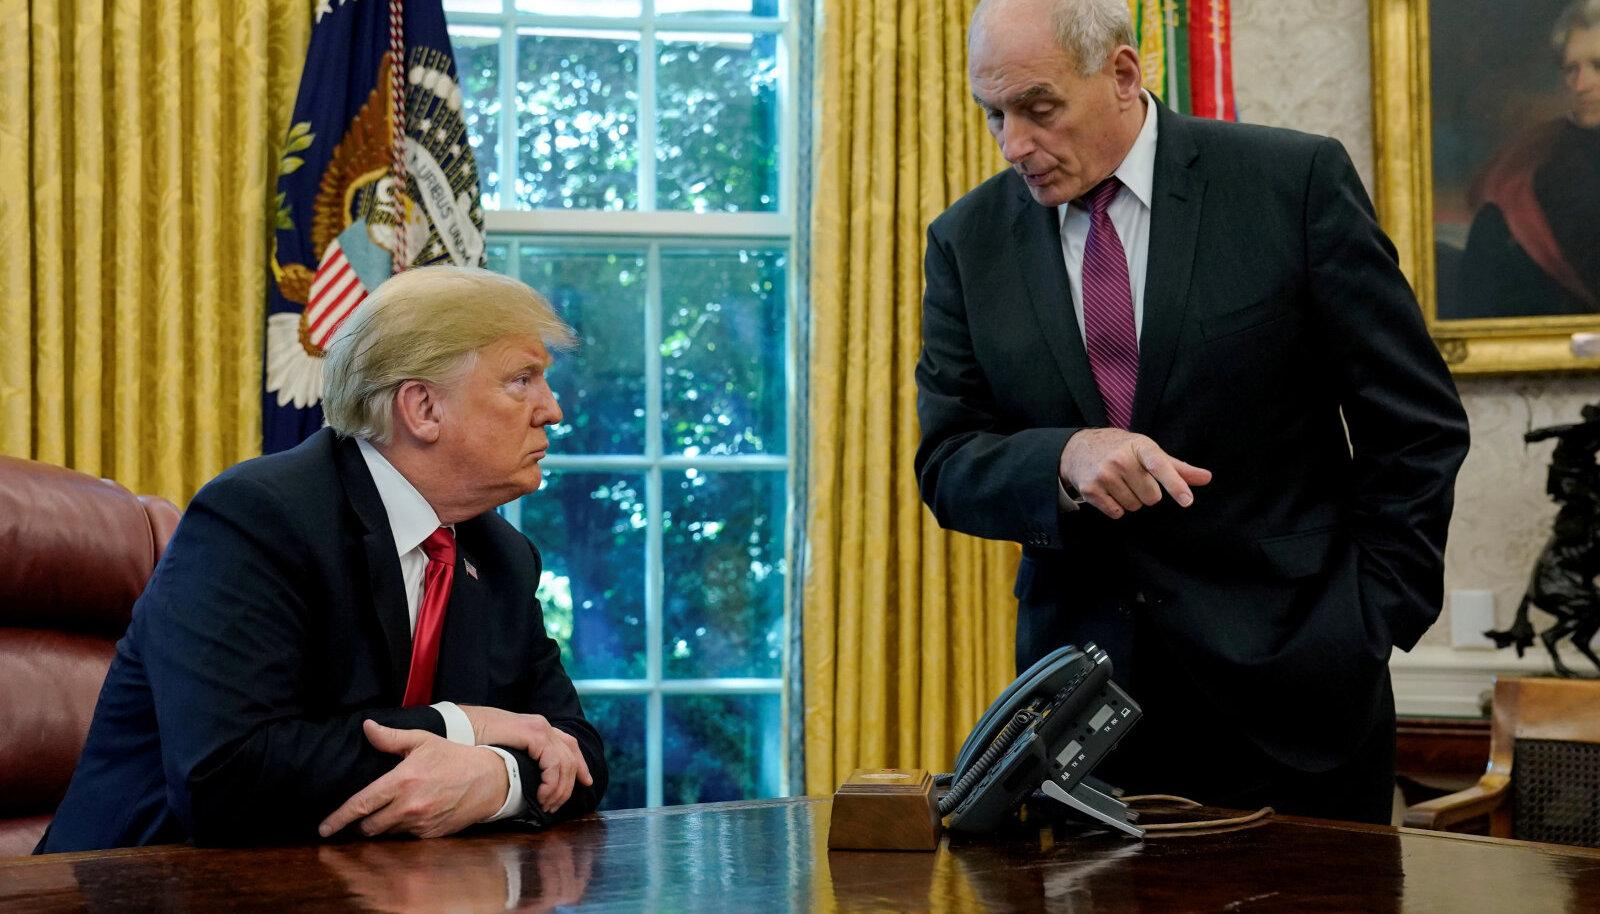 Donald Trump ja John Kelly Valges Majas